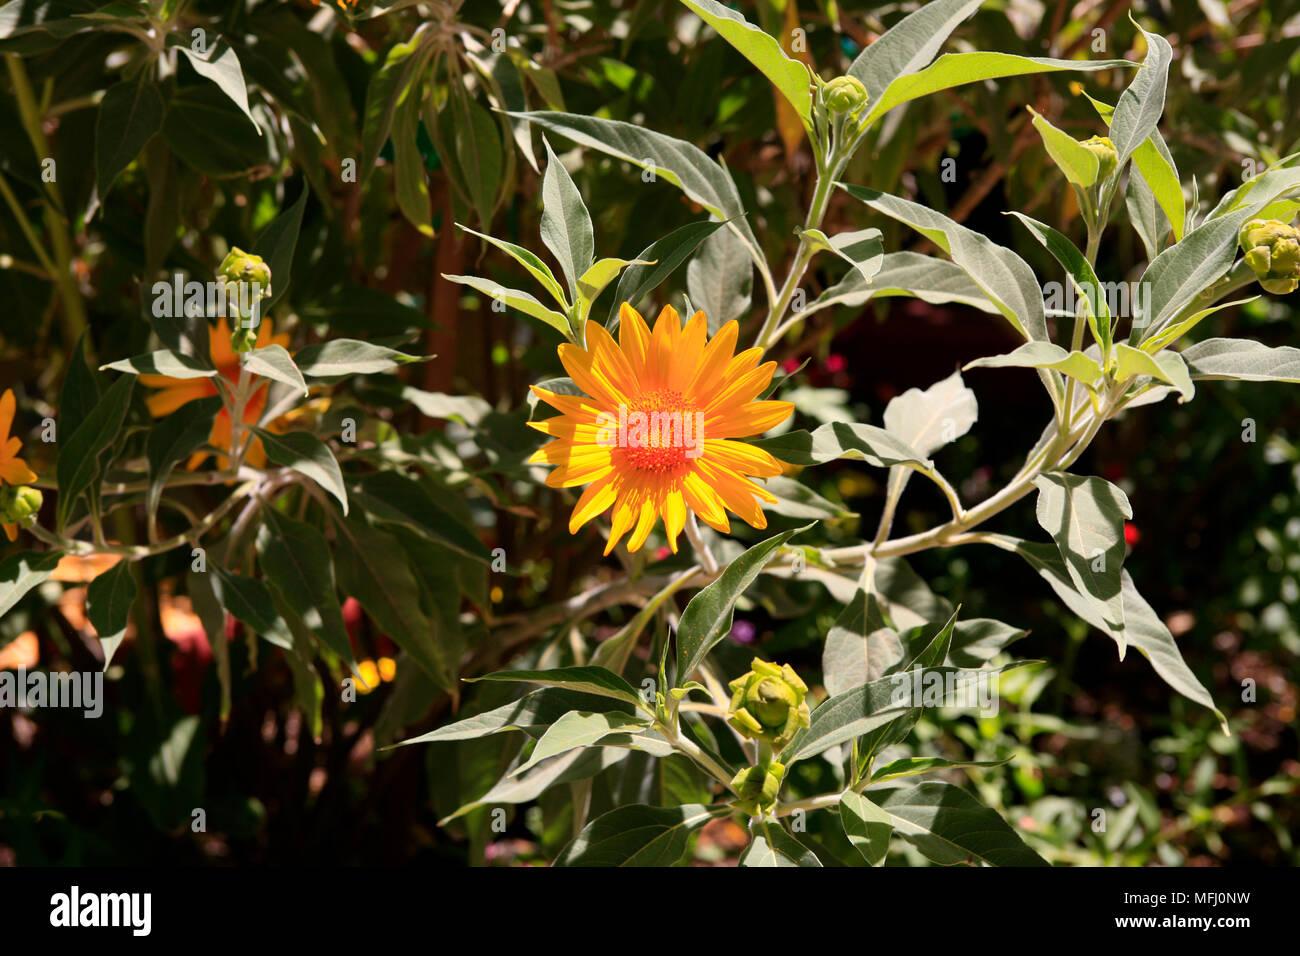 Gerbera Daisy or Transvaal Daisy with many varieties grown worldwide seen in Arizona USA - Stock Image